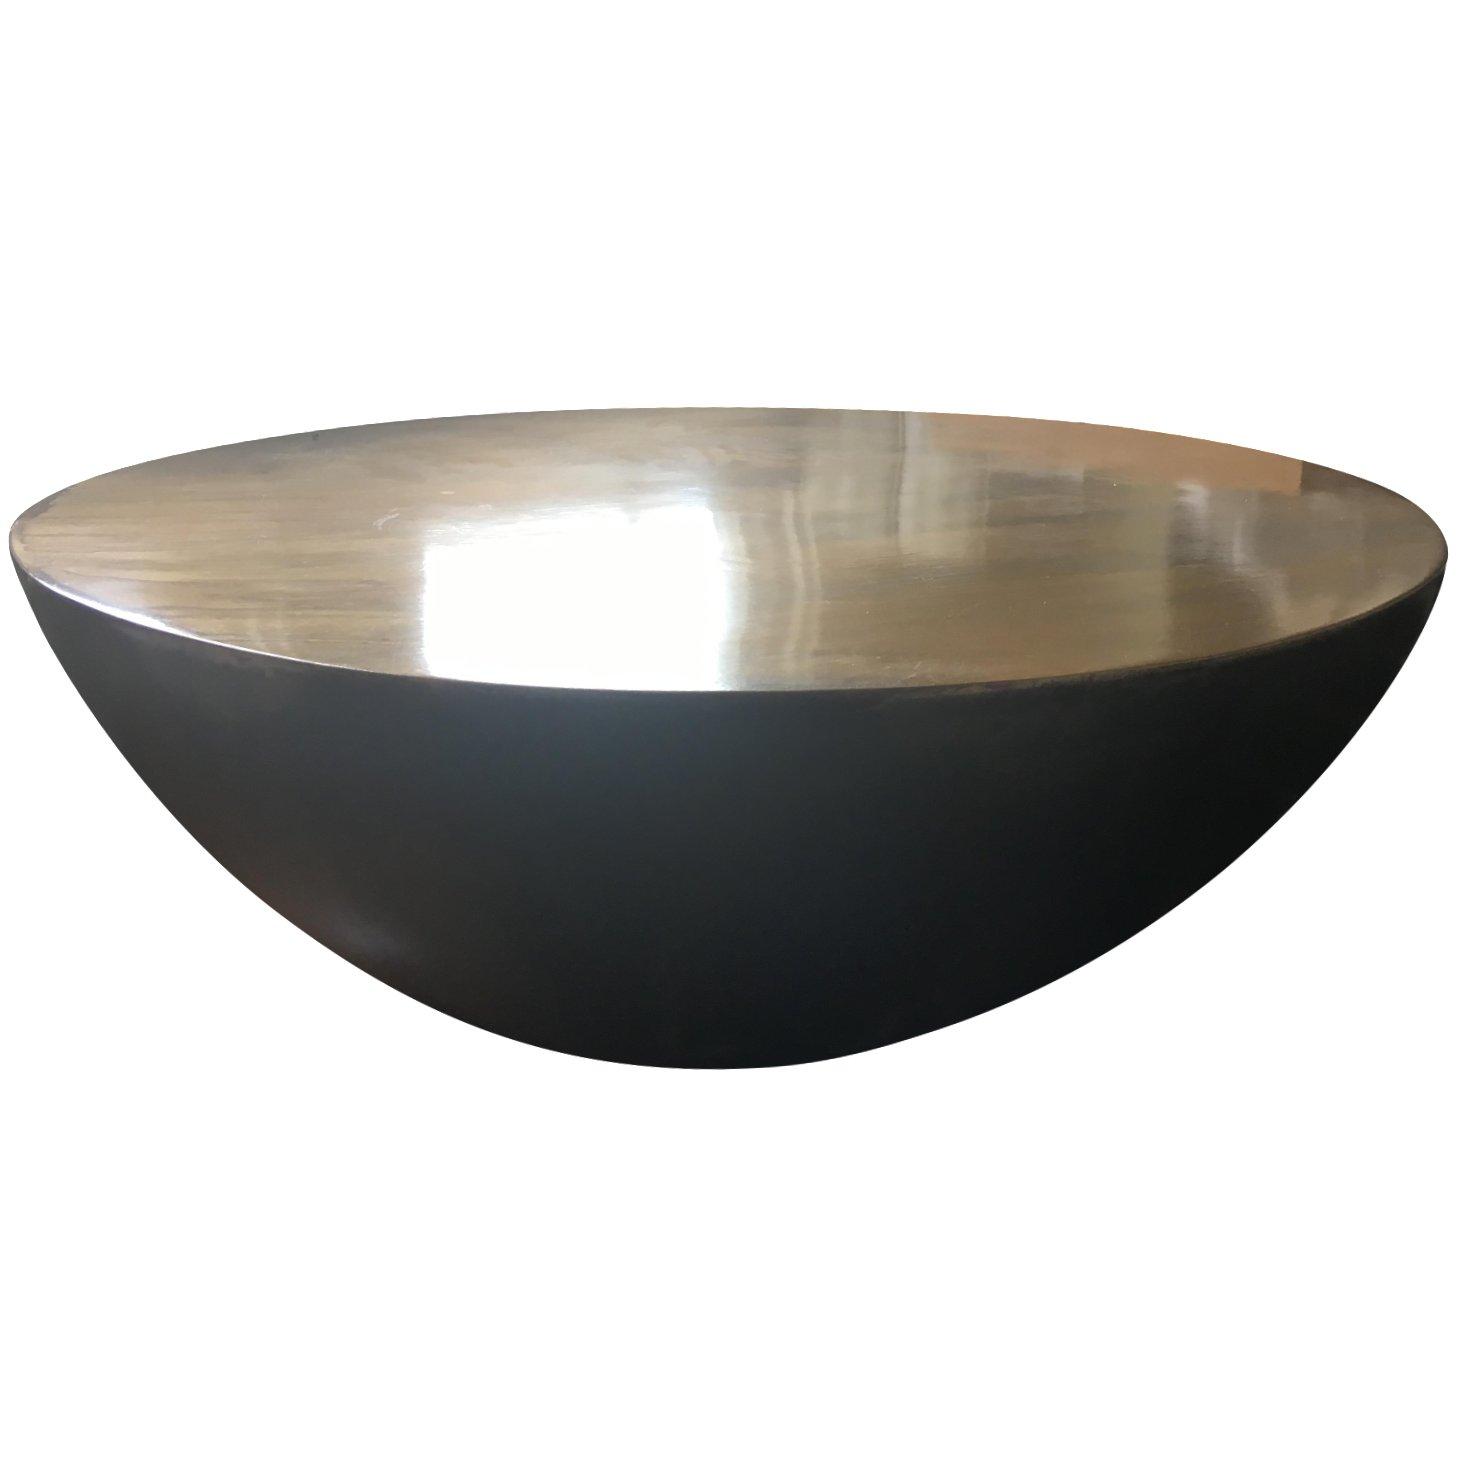 Gump's Copper Kettledrum Table | Chairish